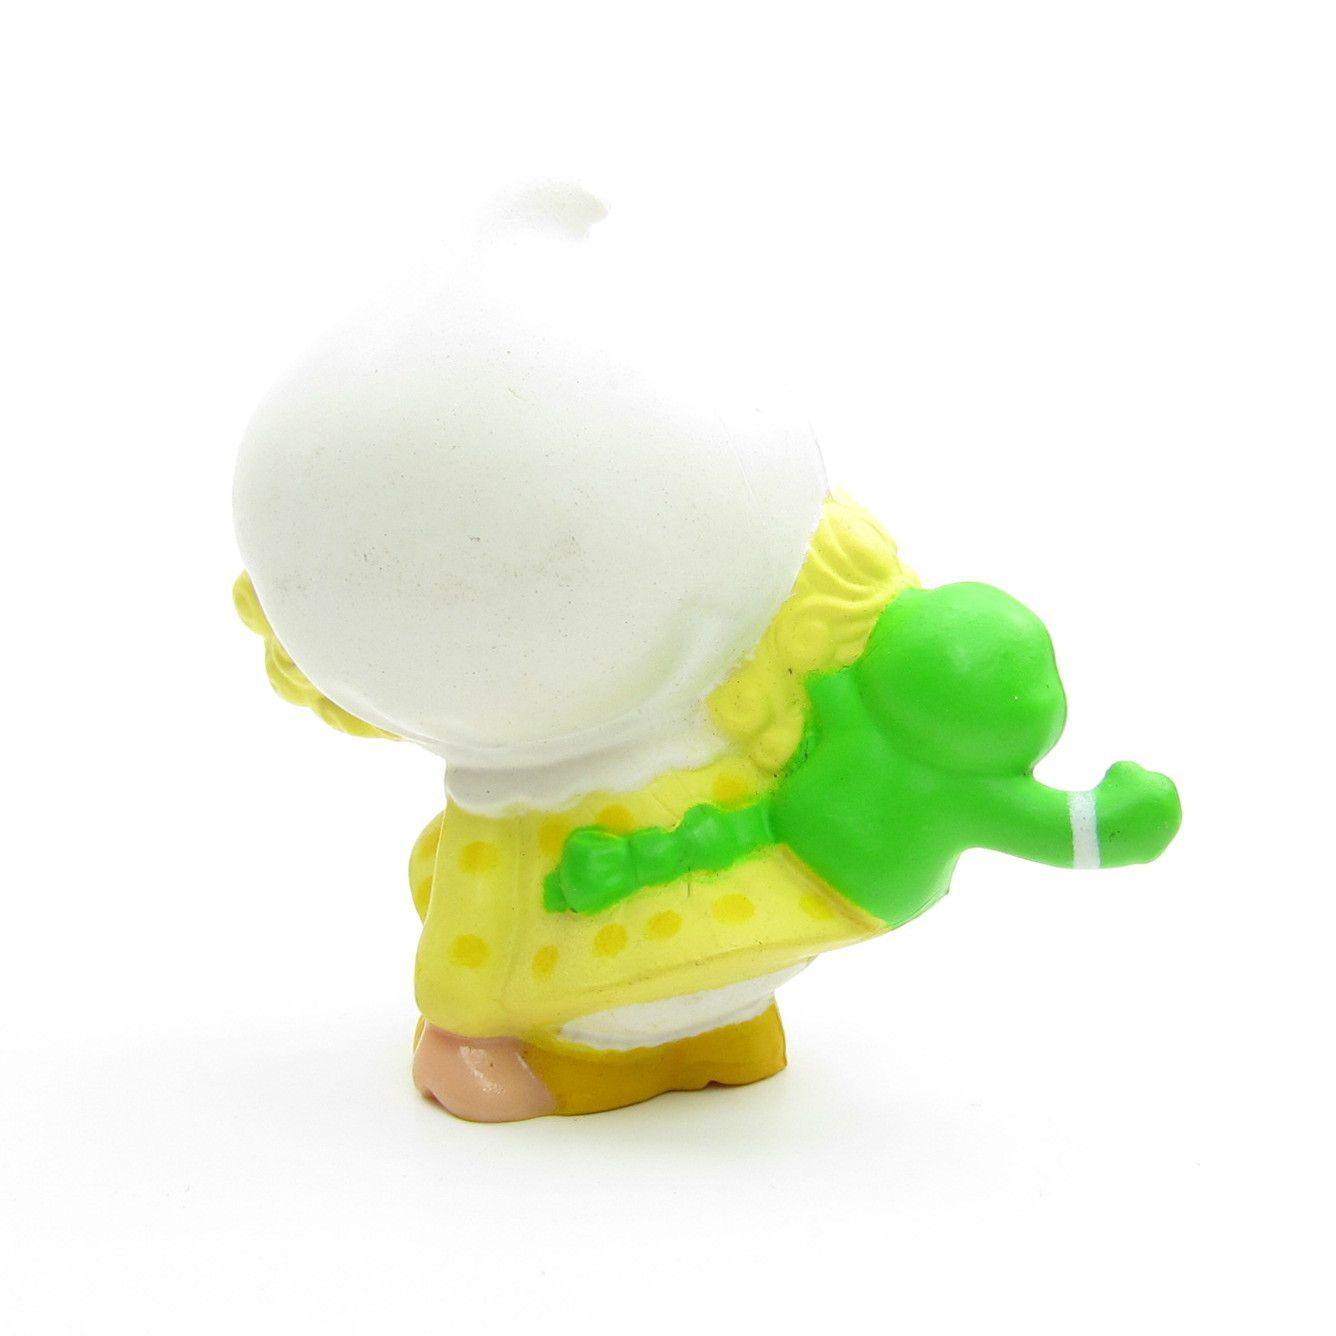 Lemon Meringue Picking a Flower Miniature Figurine   Brown